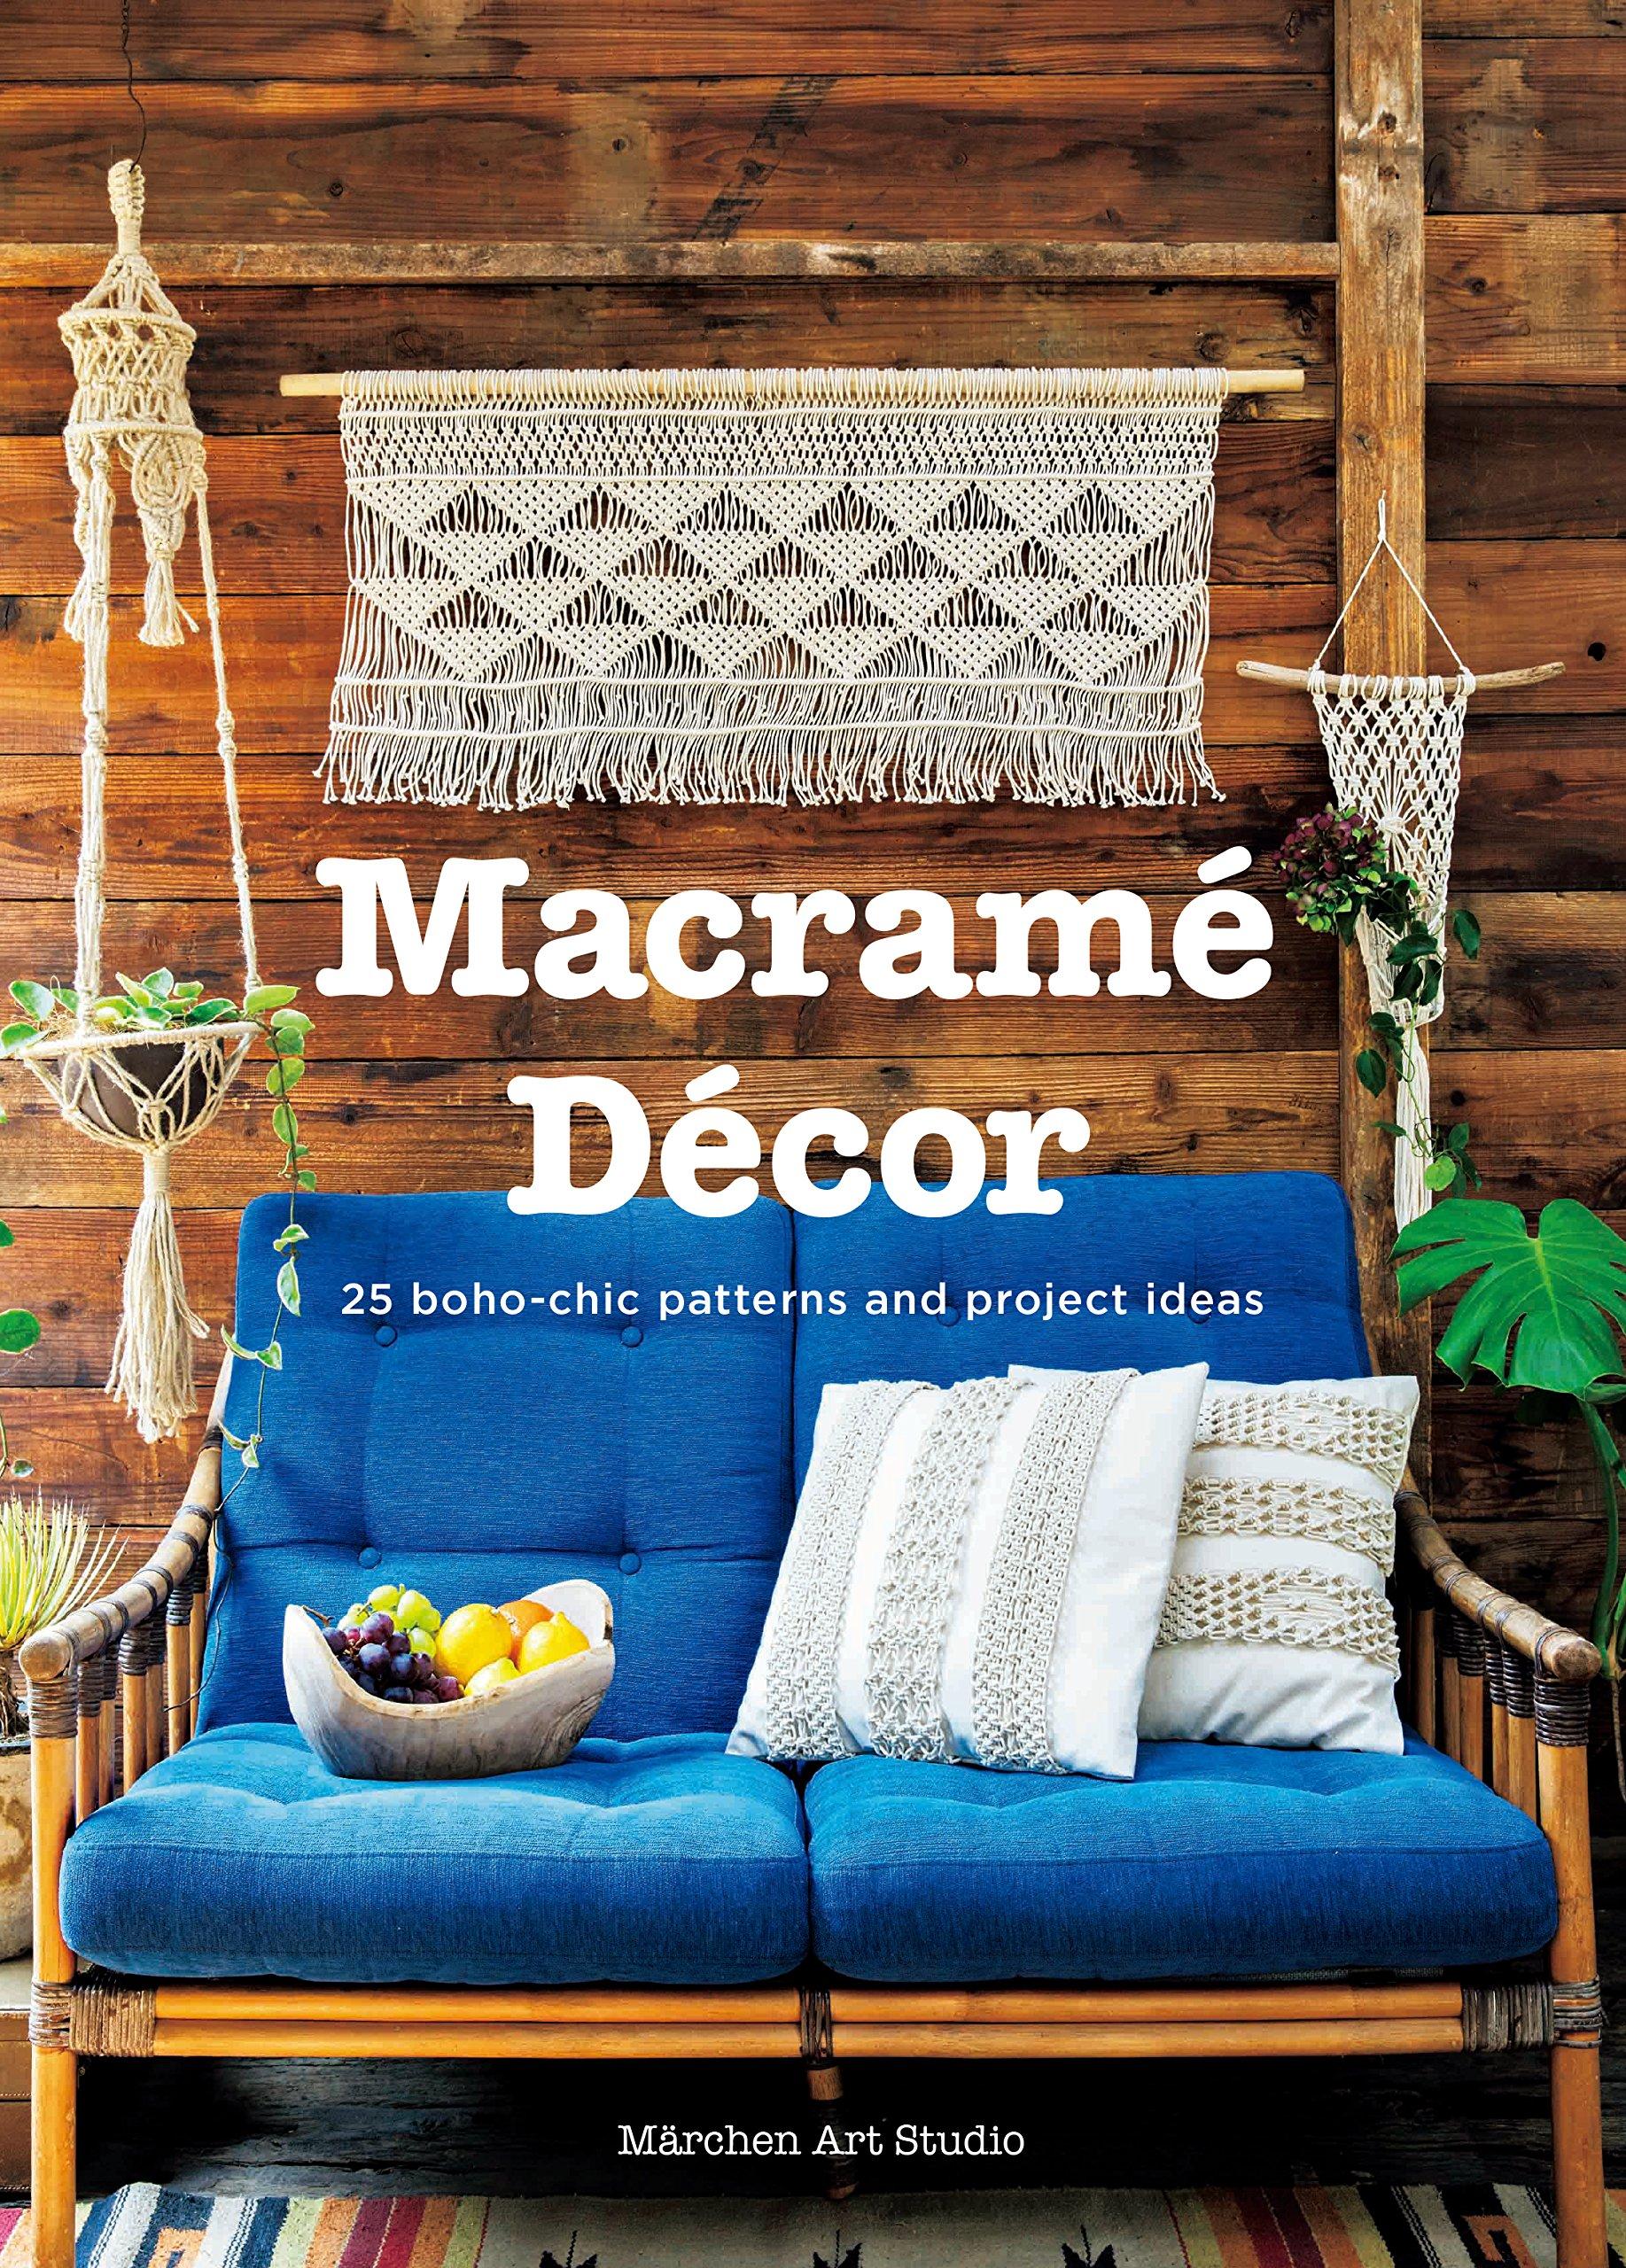 Macrame Decor: 25 Boho-Chic Patterns and Project Ideas